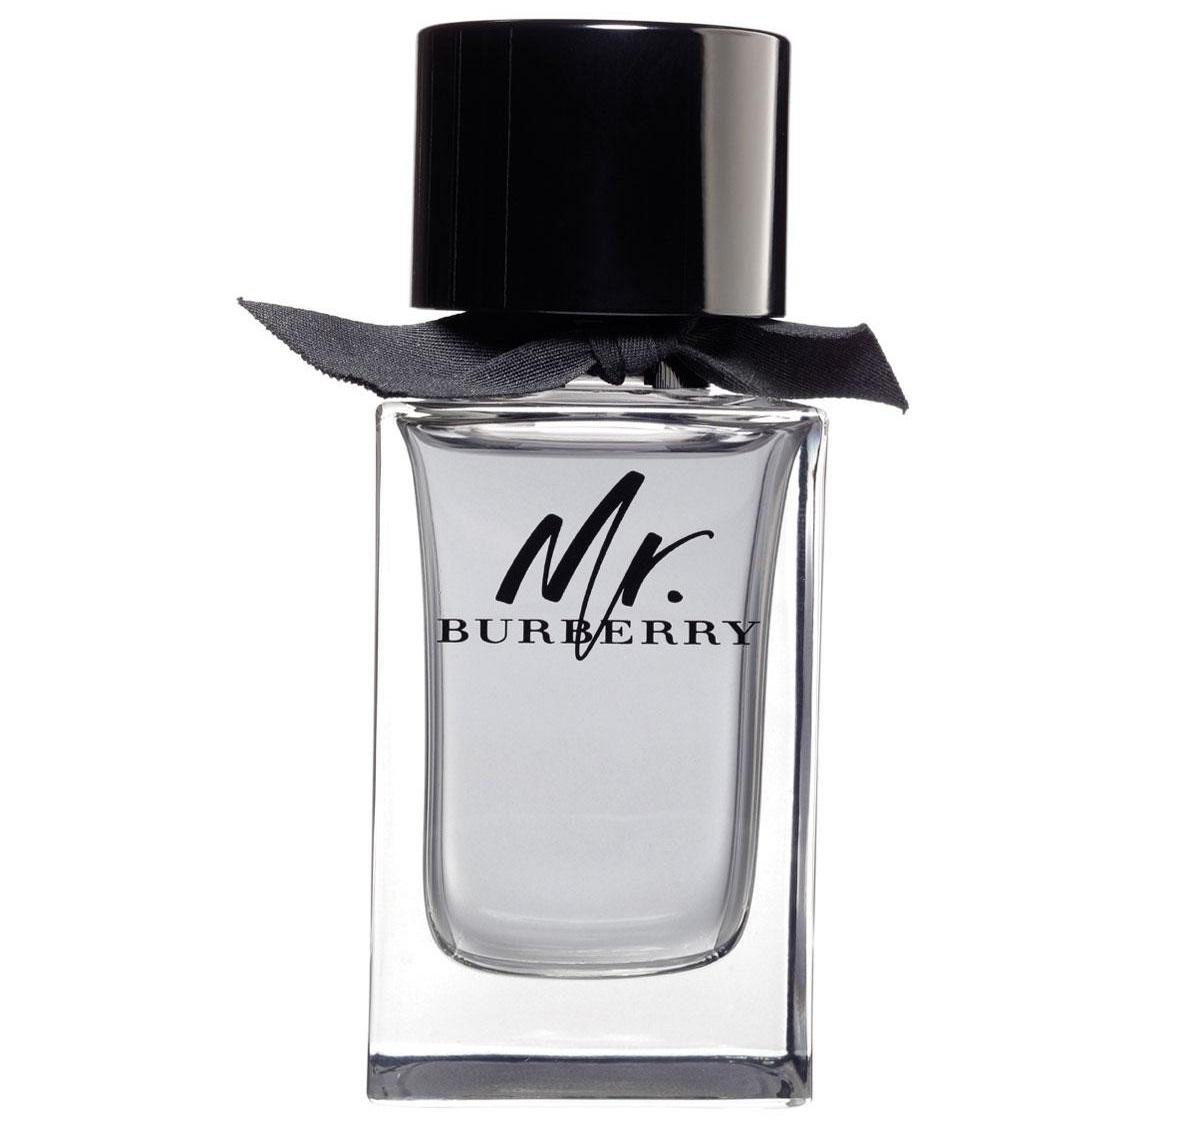 7527e055507f ... Burberry - Mr Burberry Fragrance (150ml EDT) image